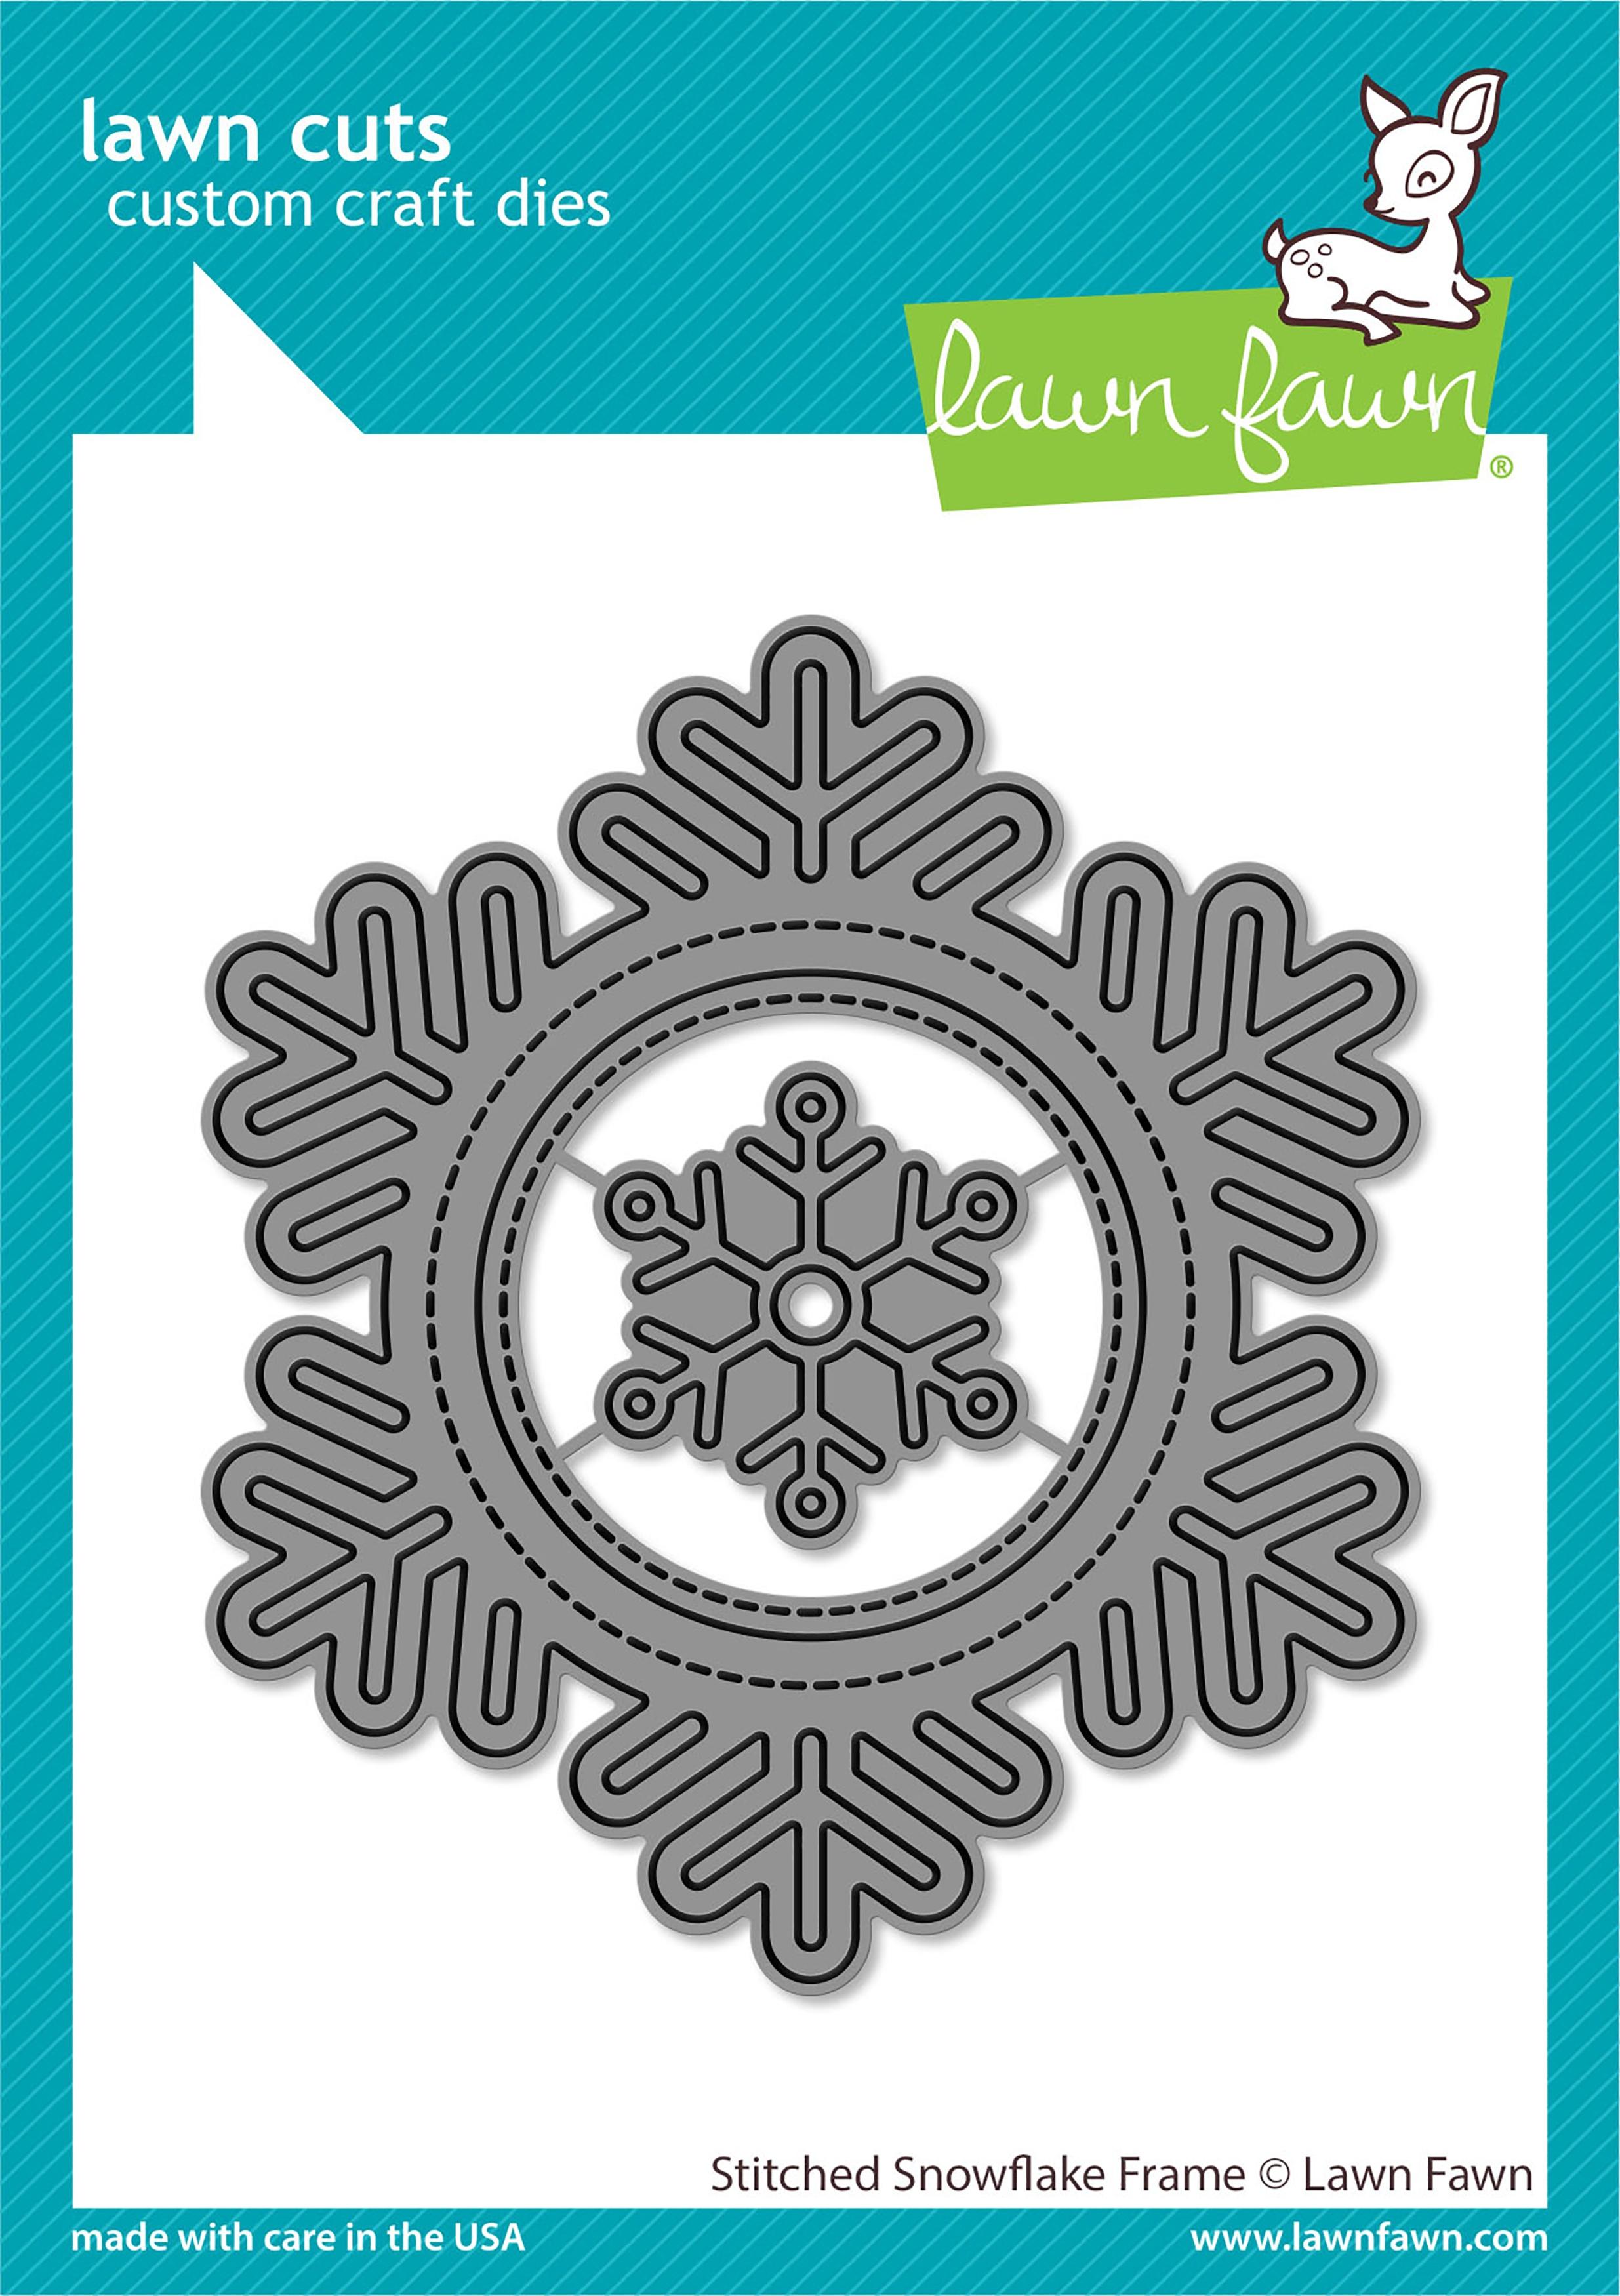 Lawn Cuts Custom Craft Die-Stitched Snowflake Frame